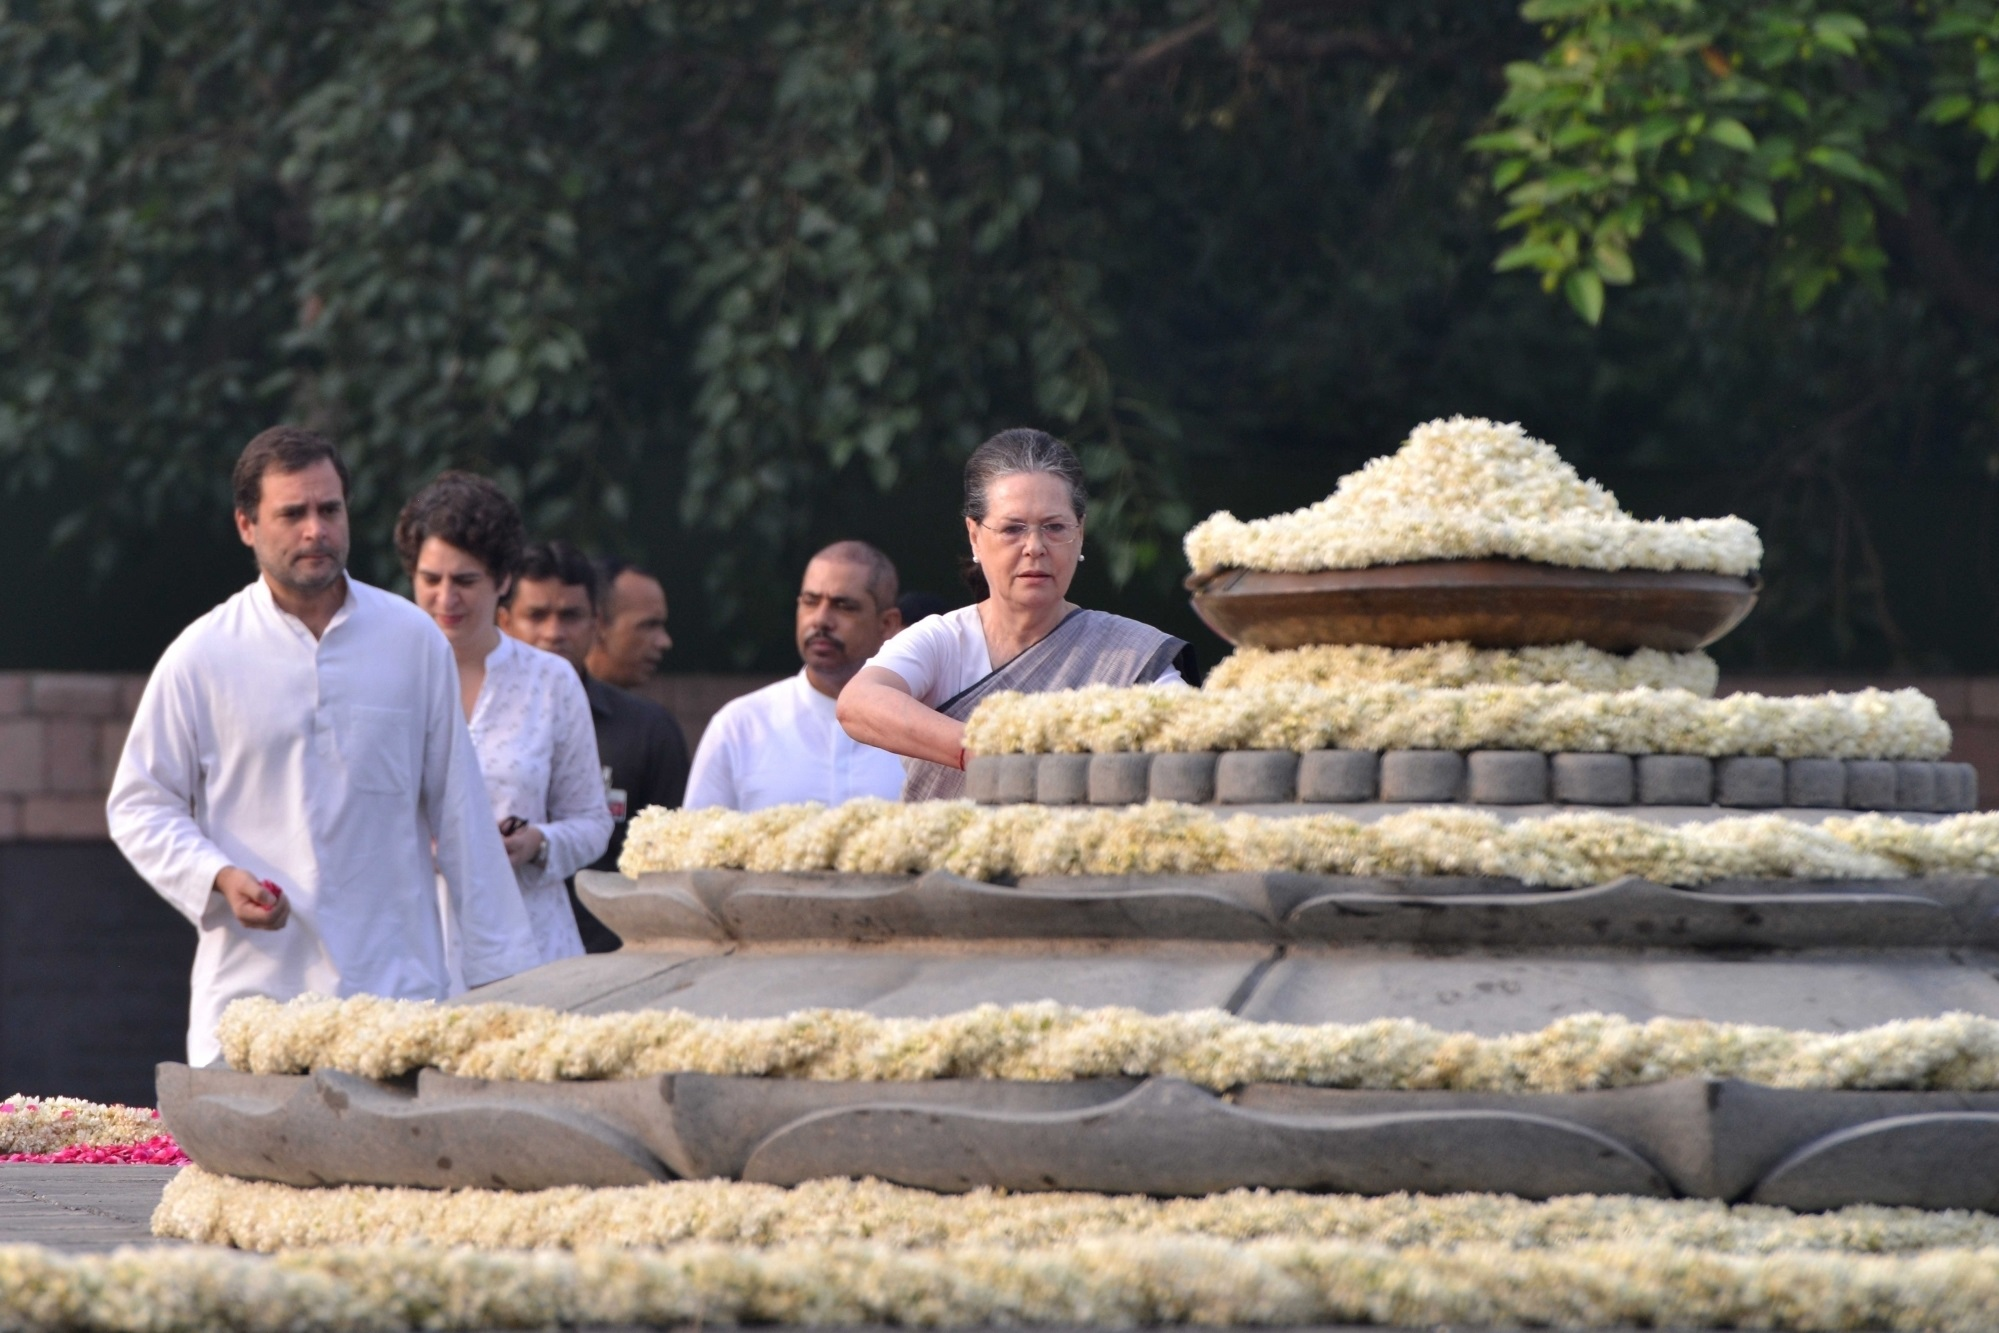 Rajiv Gandhi, Rahul Gandhi, Sonia Gandhi, UPA chairperson, Congress party, Birth anniversary, Former Prime Minister, Priyanka Gandhi Vadra, Robert Vadra, National news